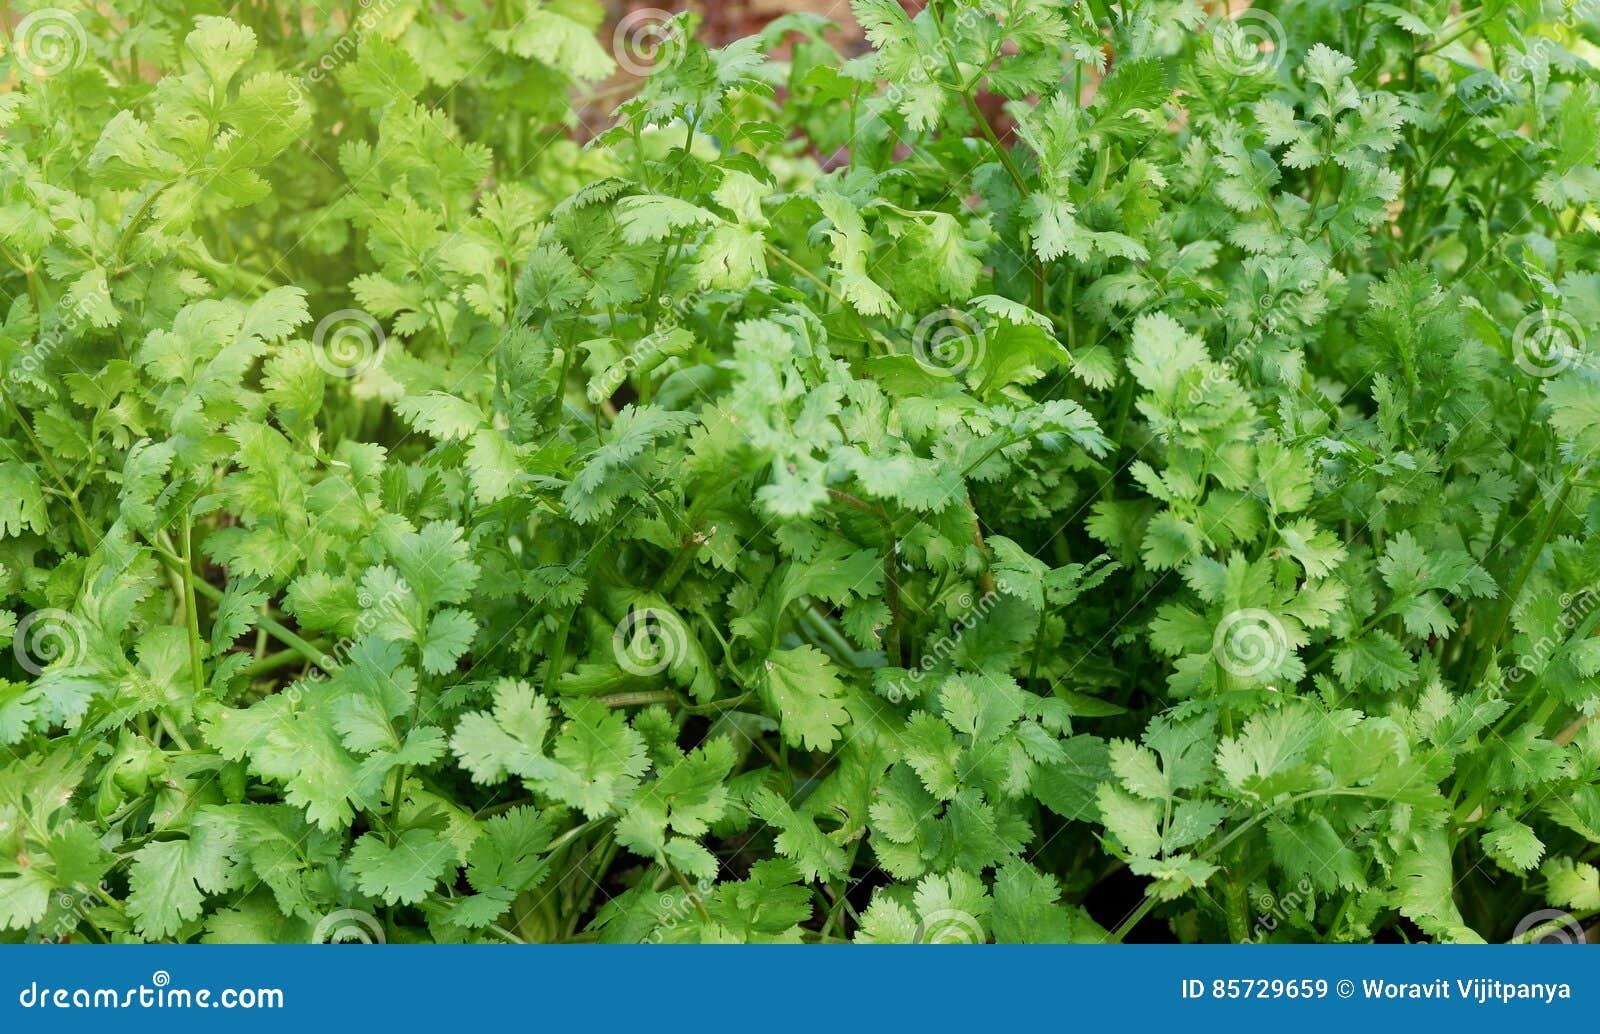 Herb Series Coriander/Cilantro